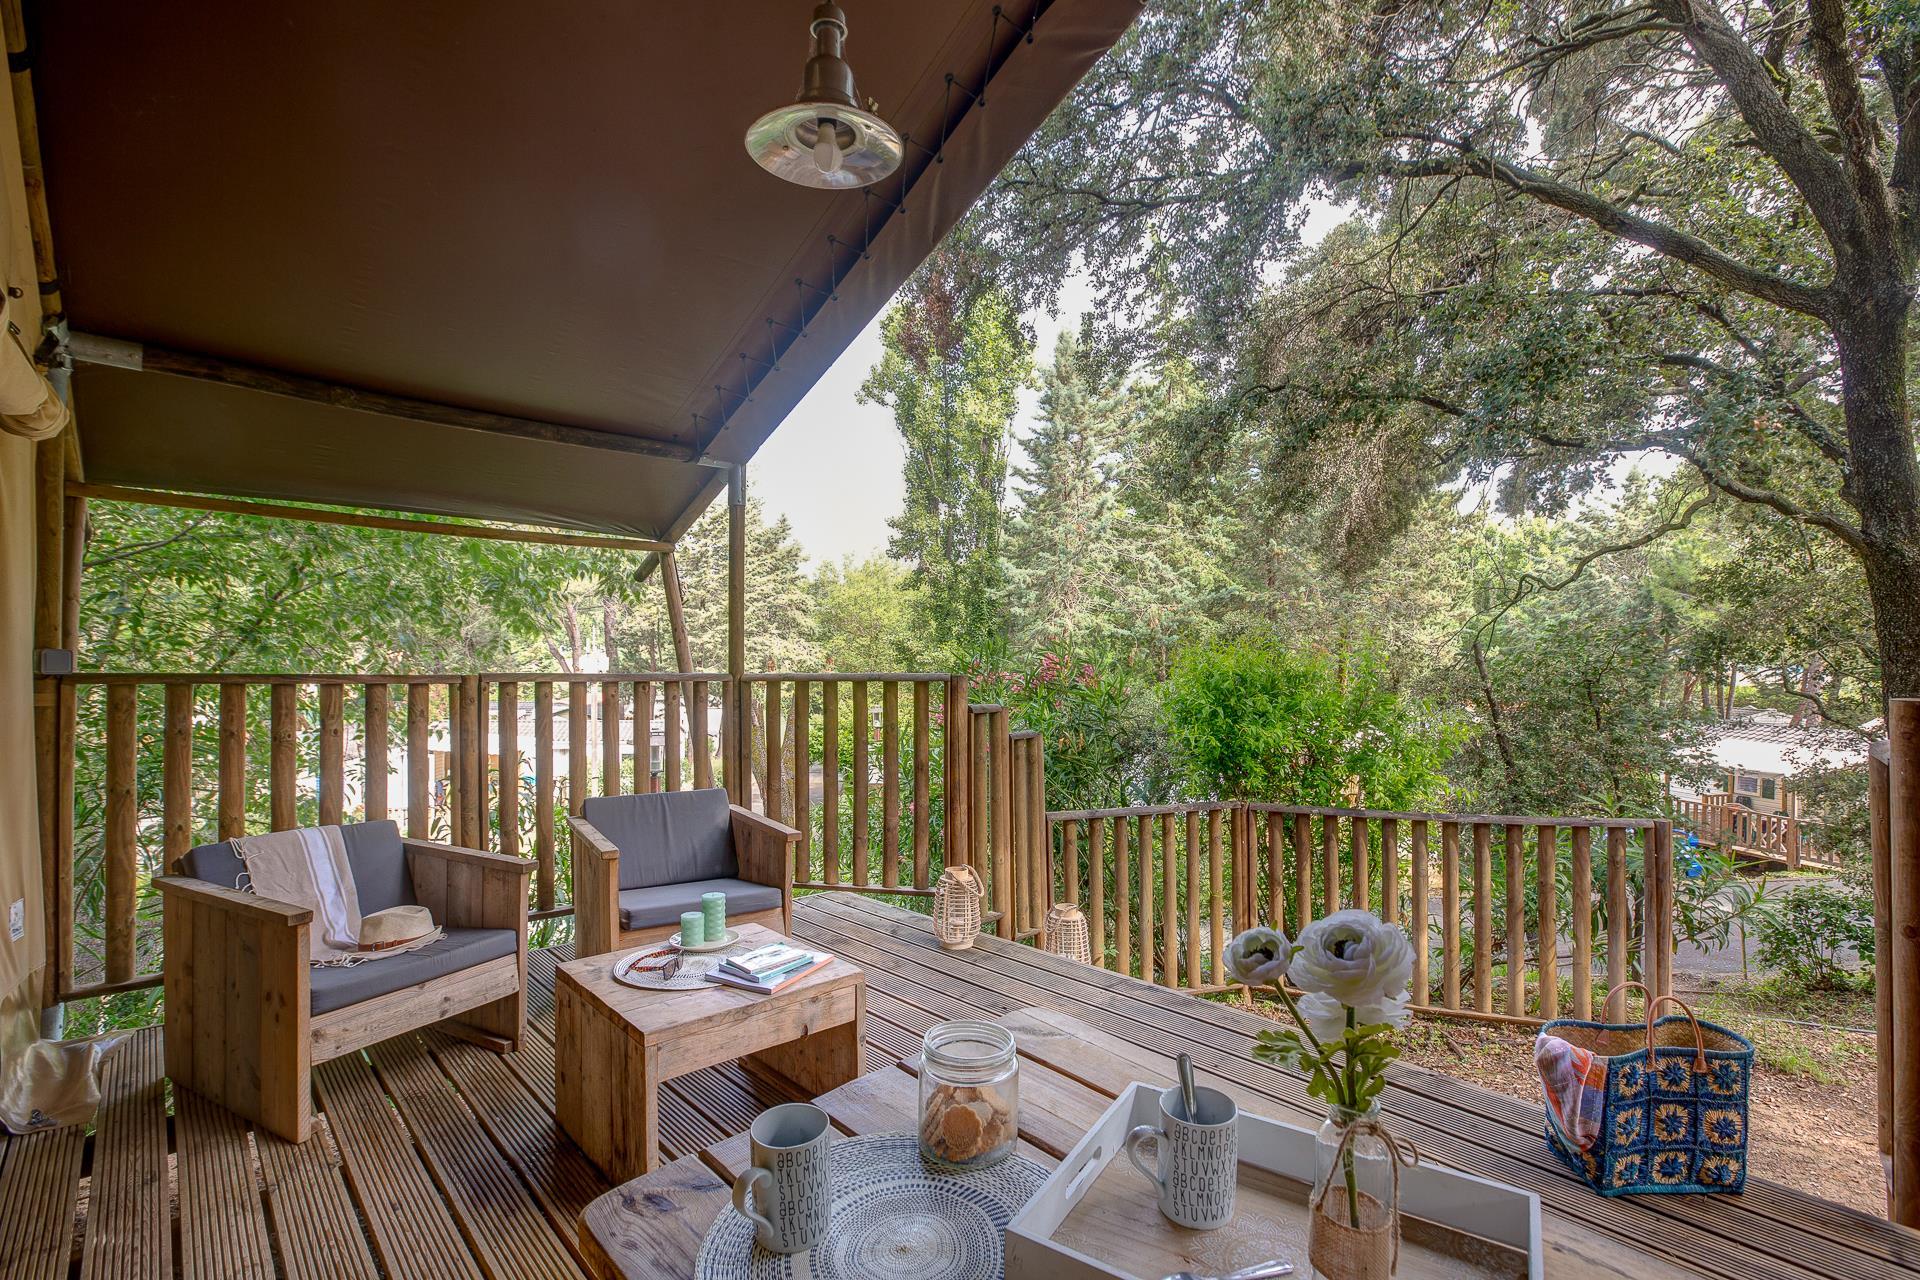 Location - Lodge Safari 2 Chambres **** - Camping Sandaya Plein Air des Chênes